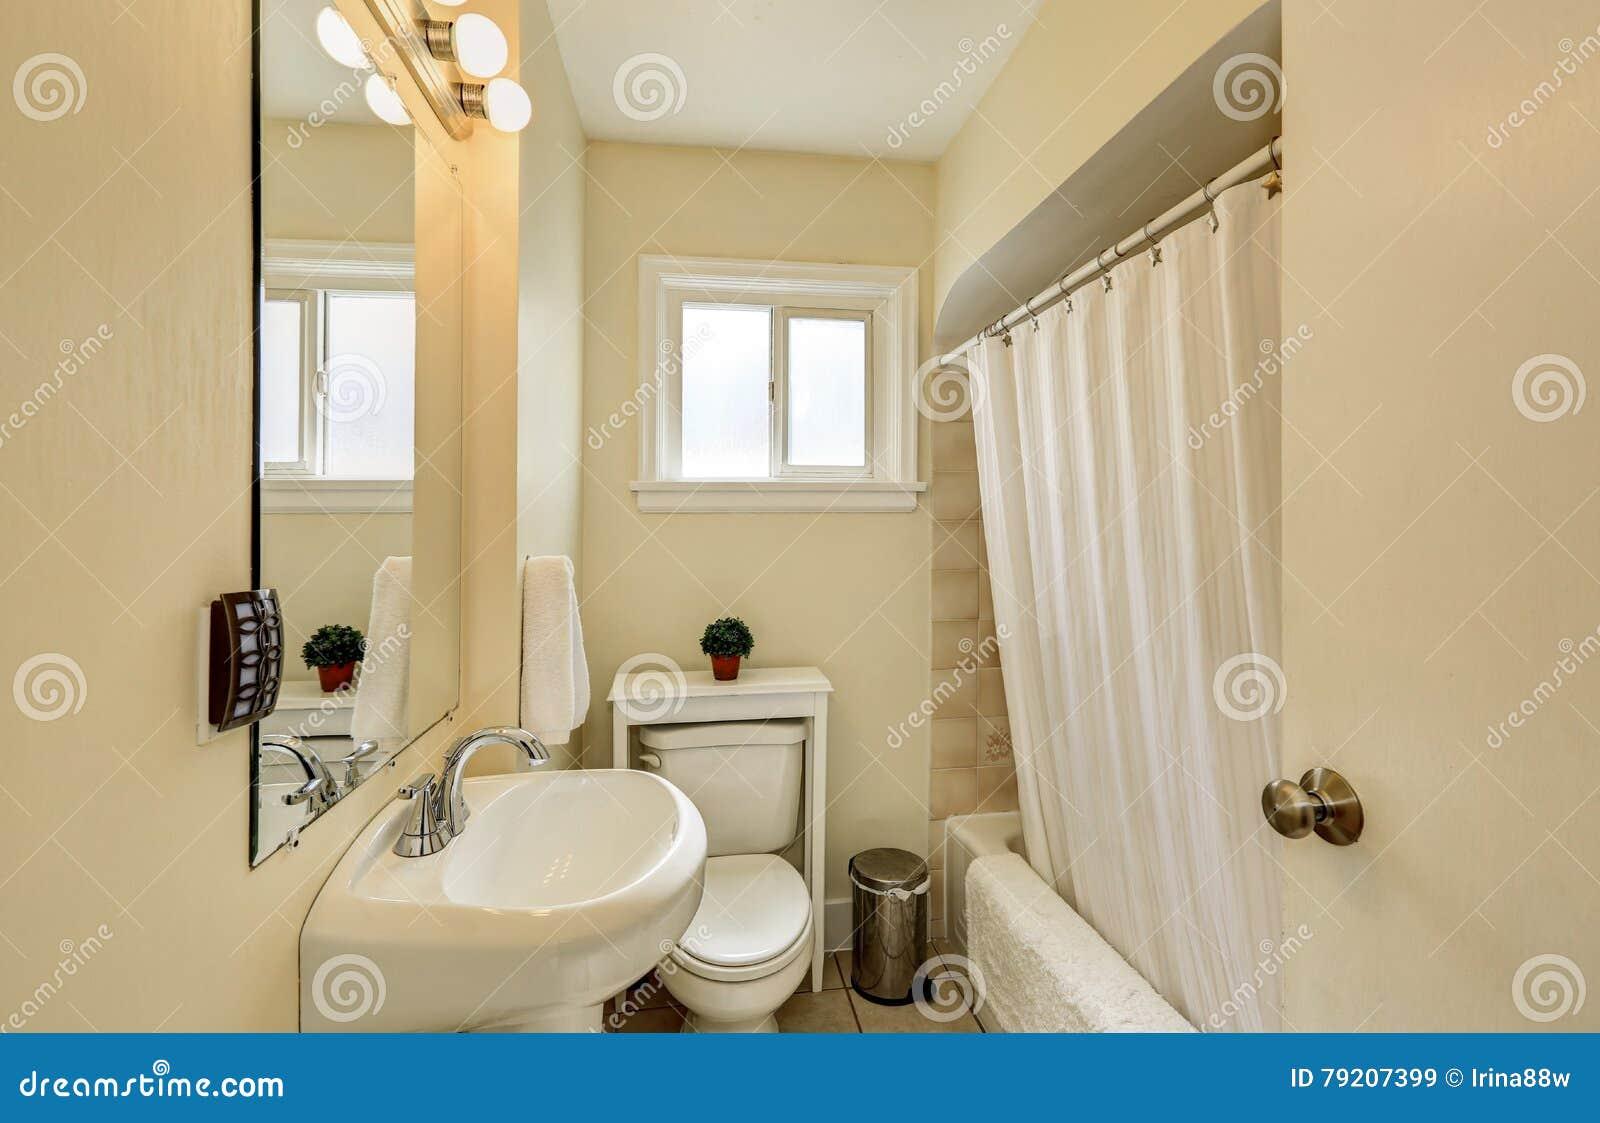 creamy tones bathroom interior in old craftsman house stock photo